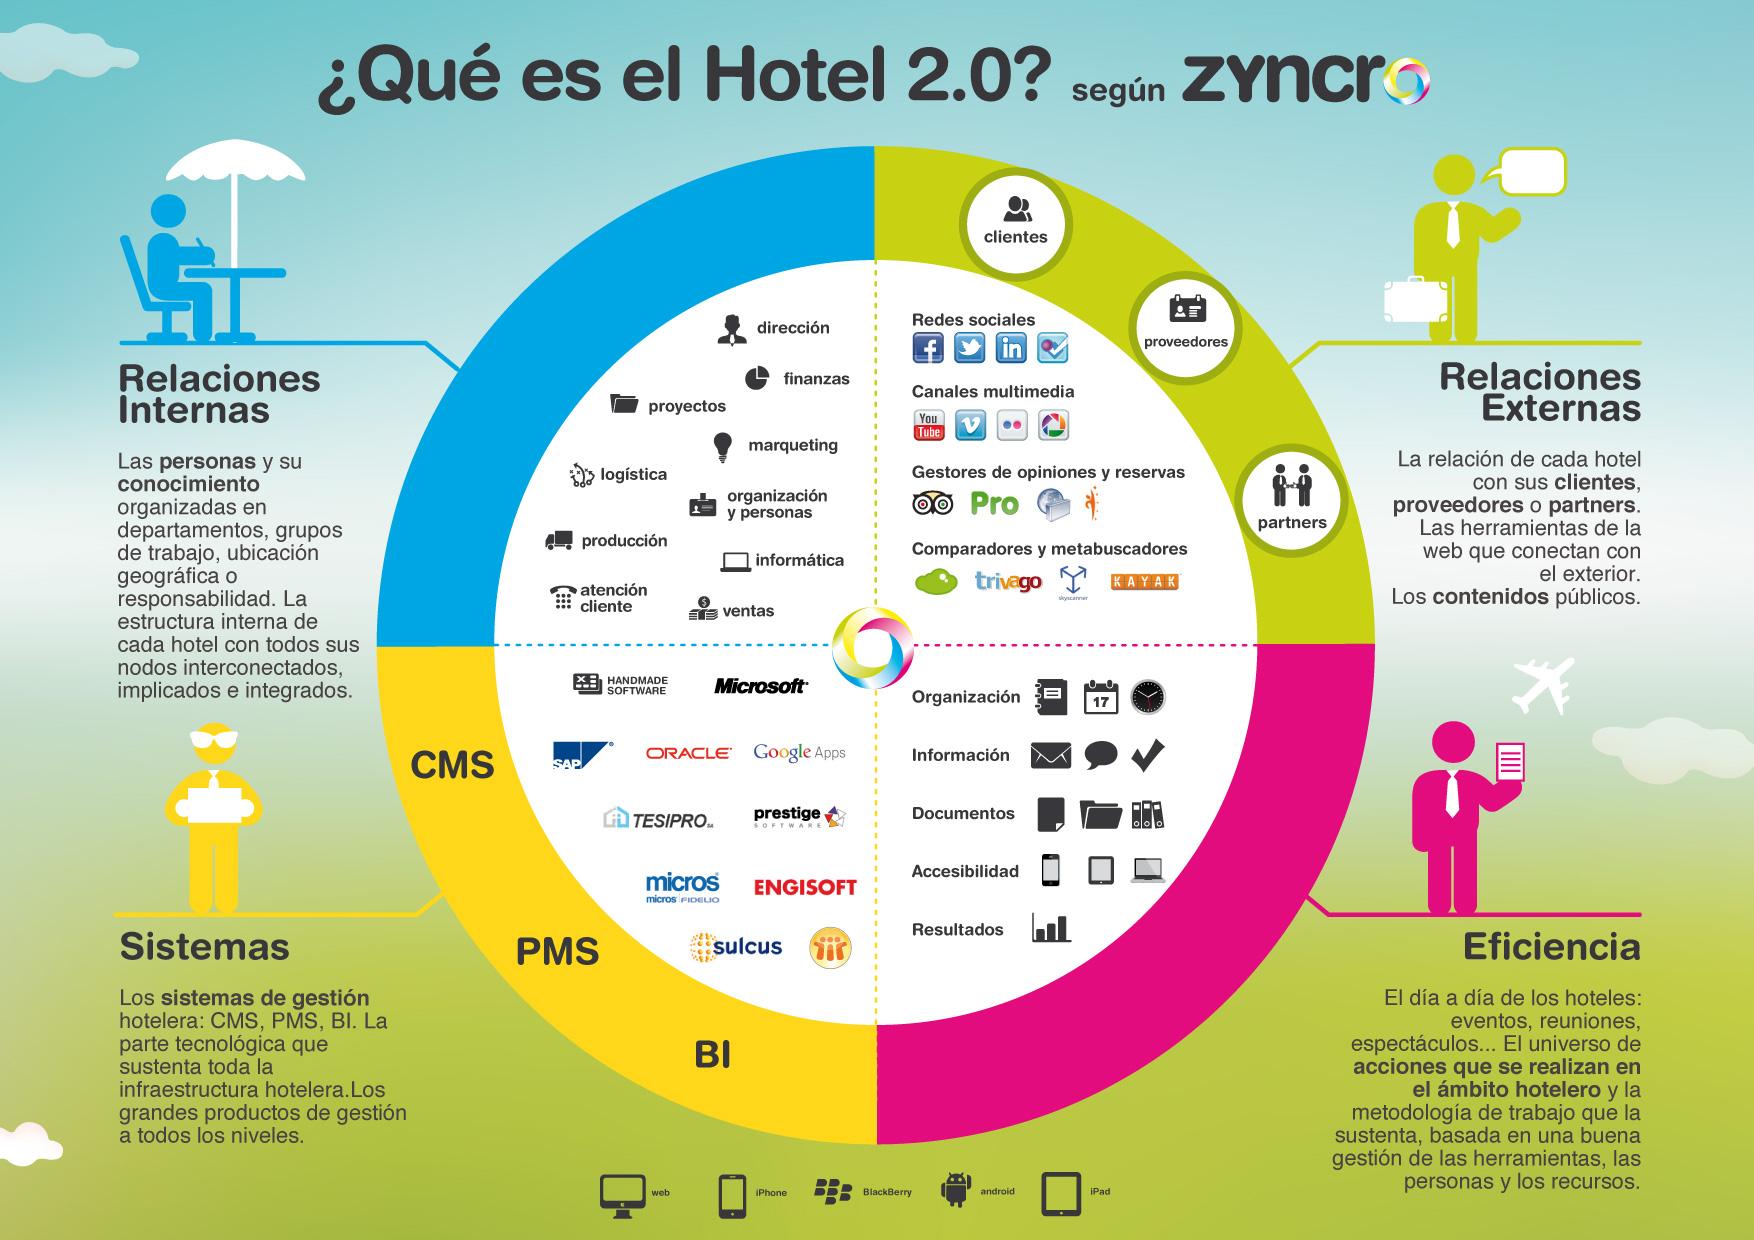 hotel 2.0